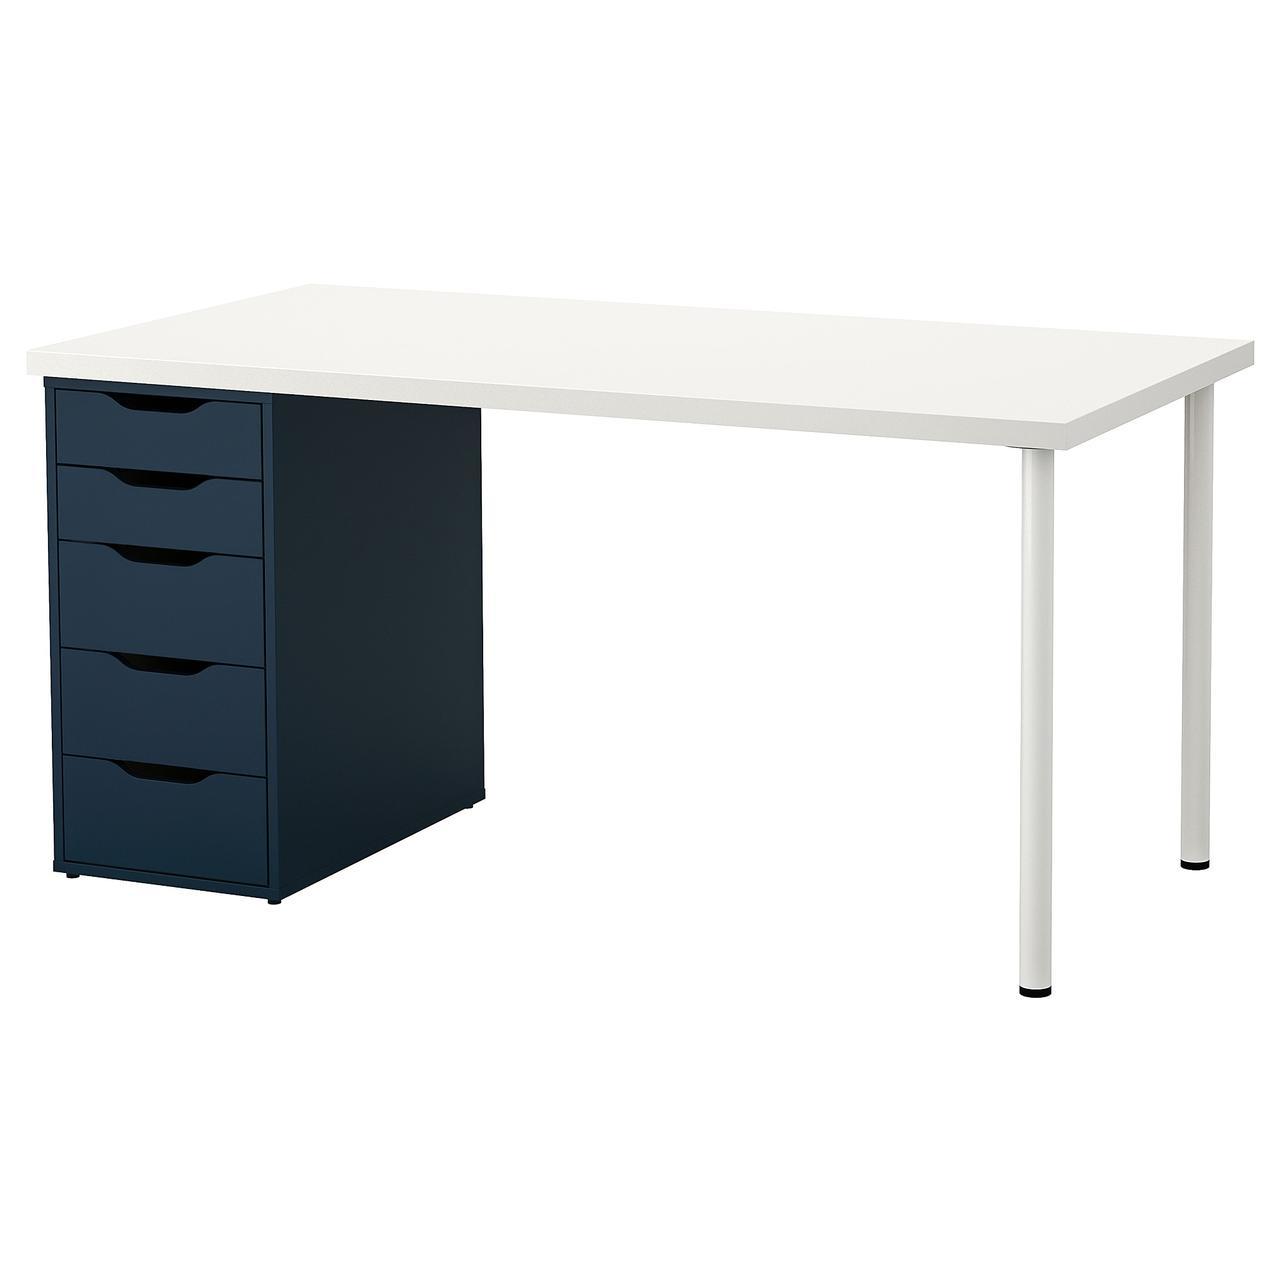 Компьютерный стол IKEA LINNMON / ALEX 150x75 см синий белый 093.039.98